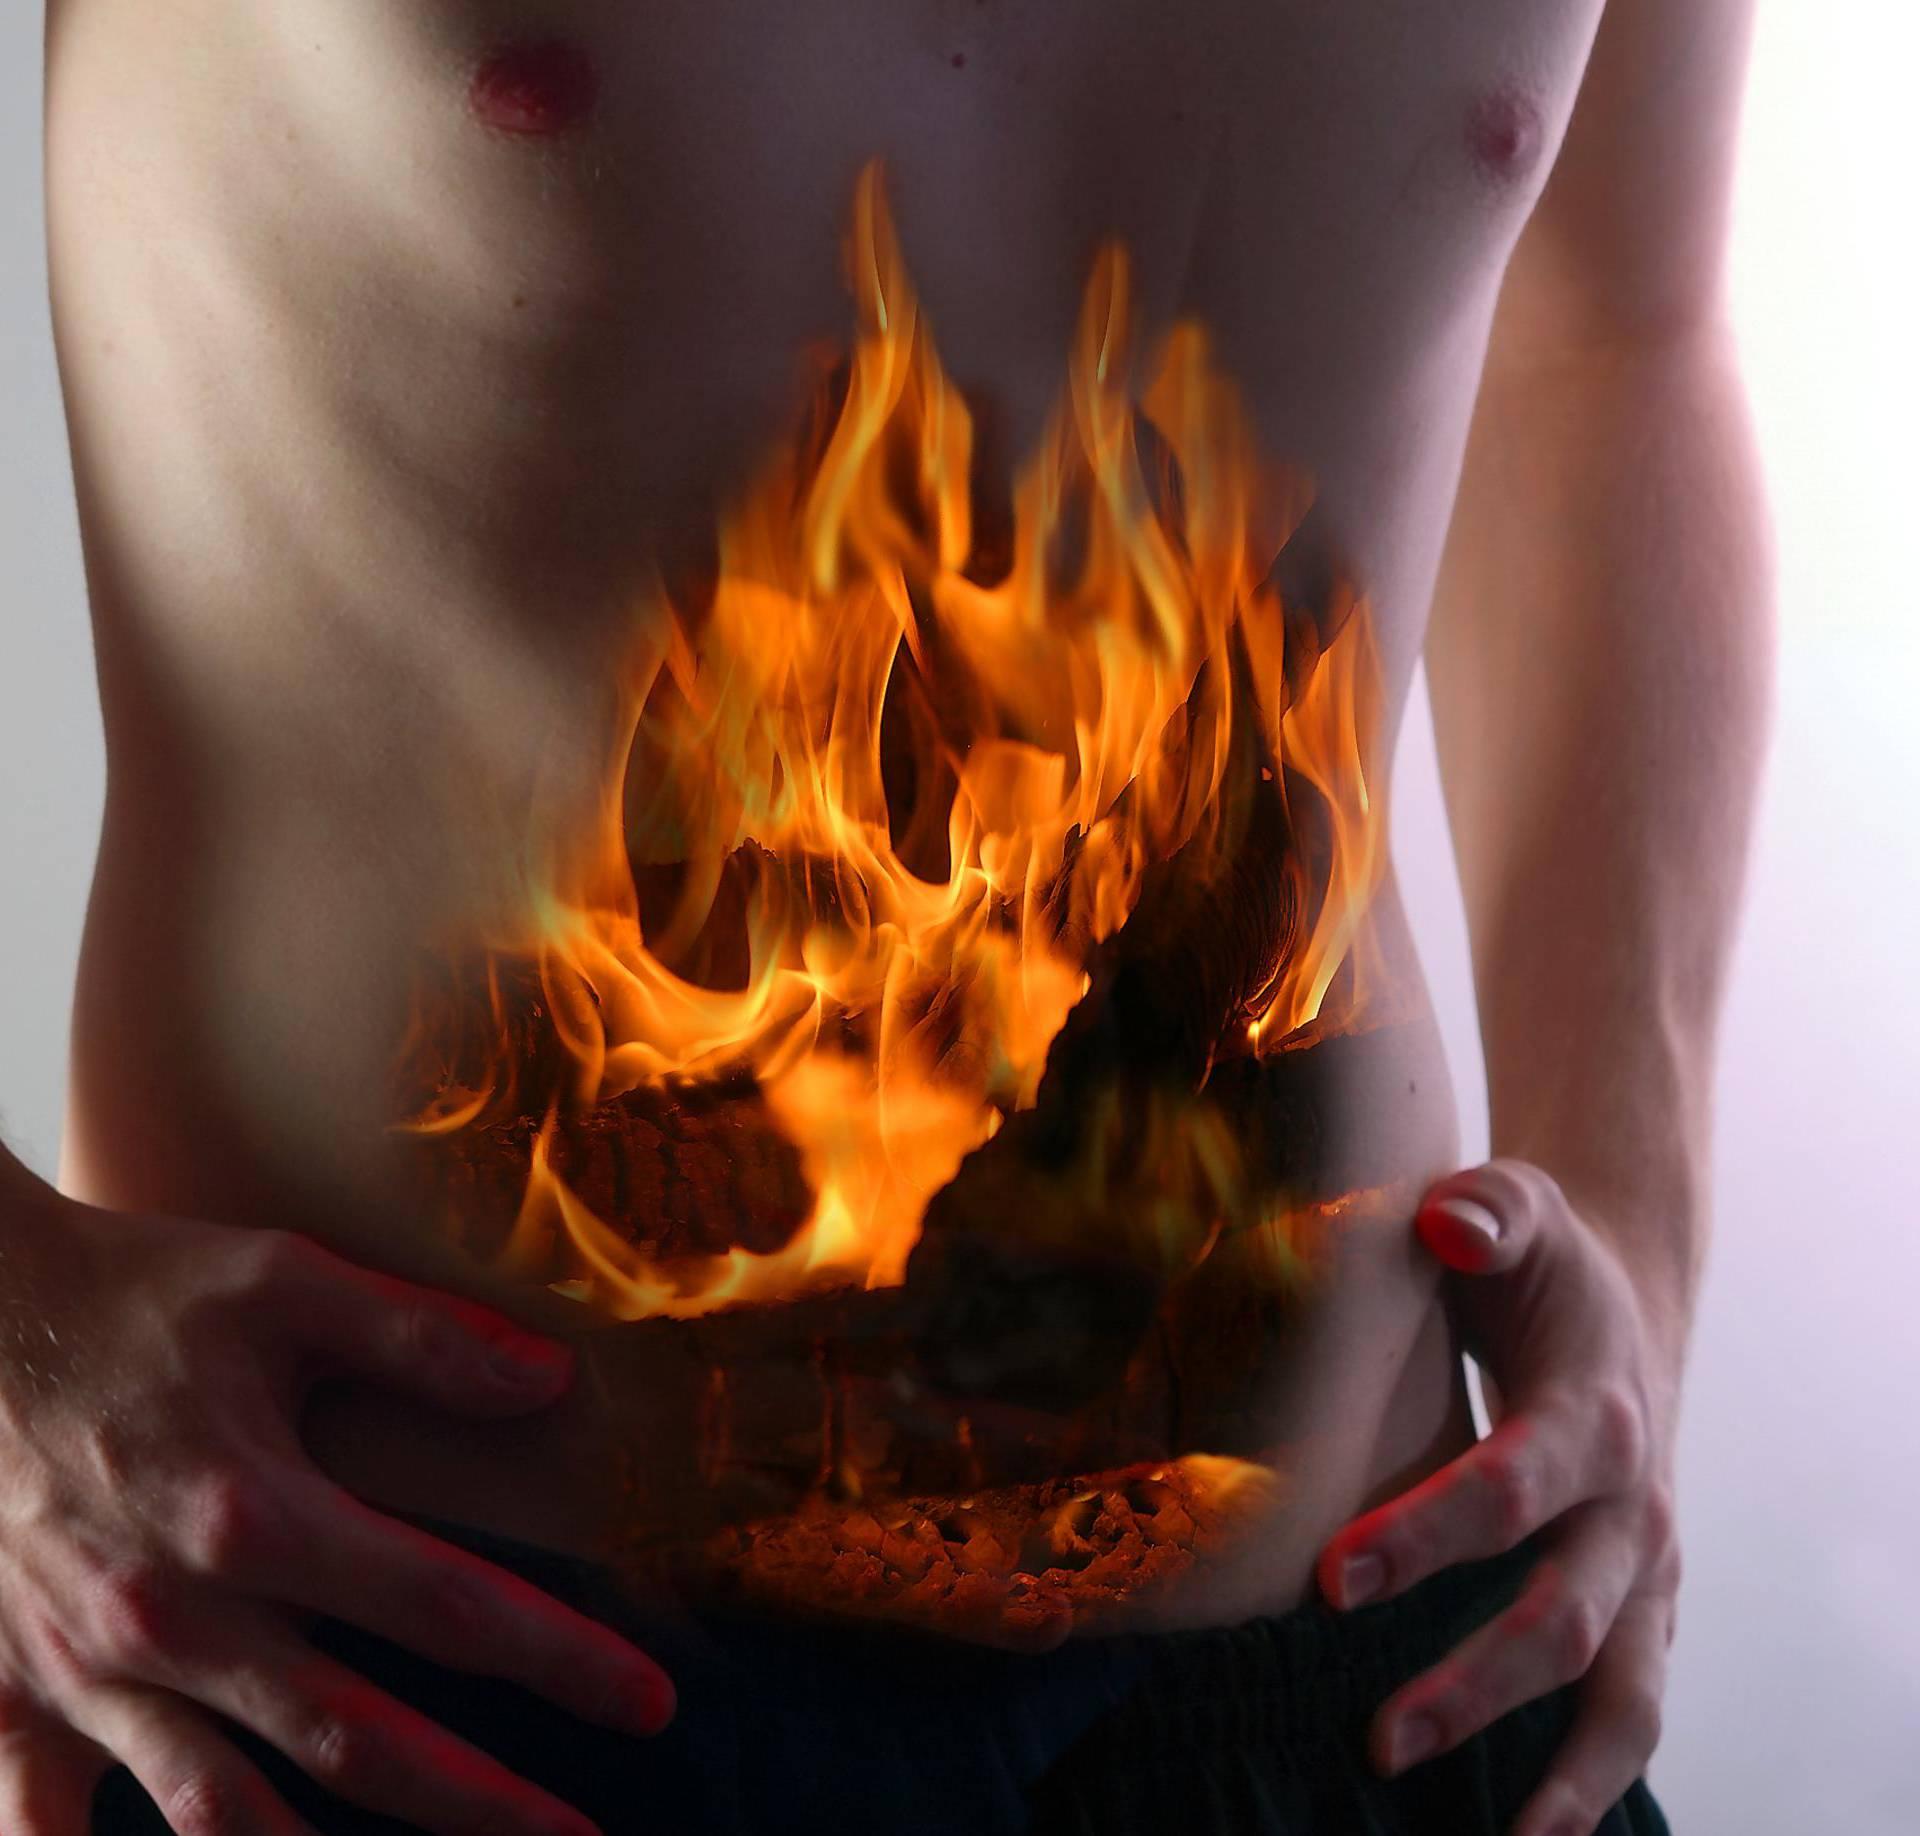 Dr. Kardum o žgaravici: Nije dobro uzimati sodu bikarbonu